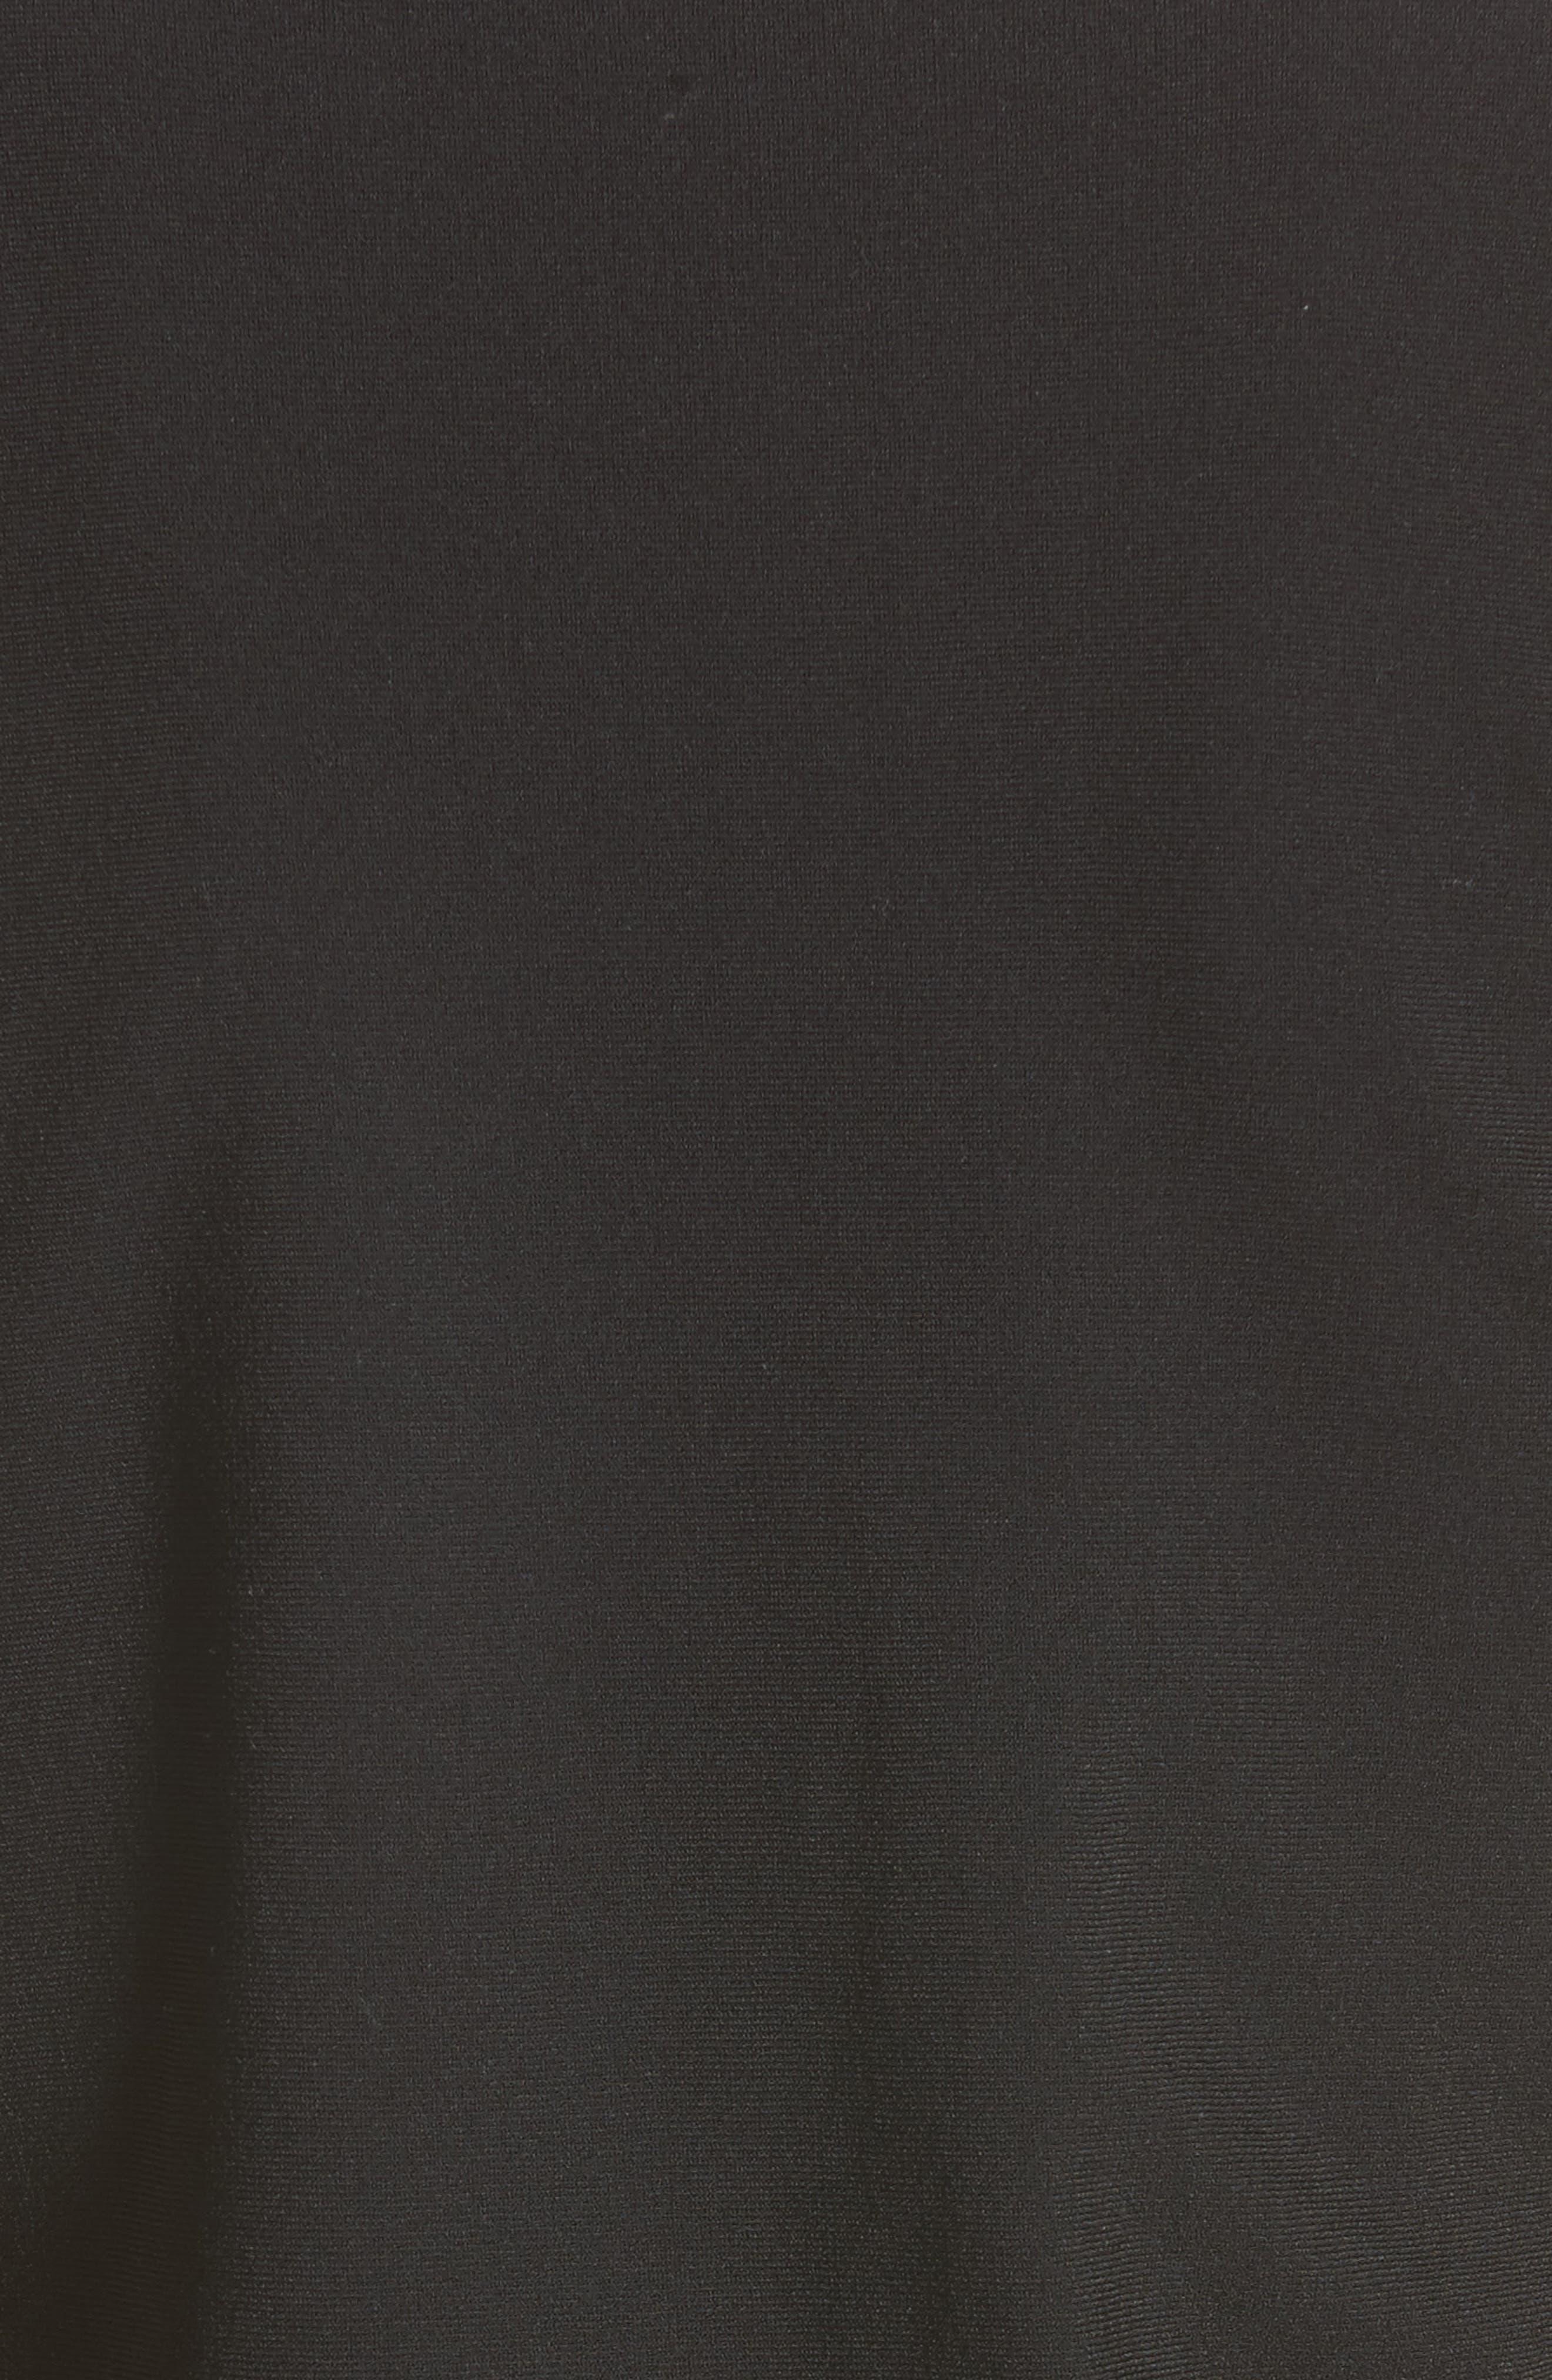 Alternate Image 3  - Max Mara Joice Ruched Knit Top